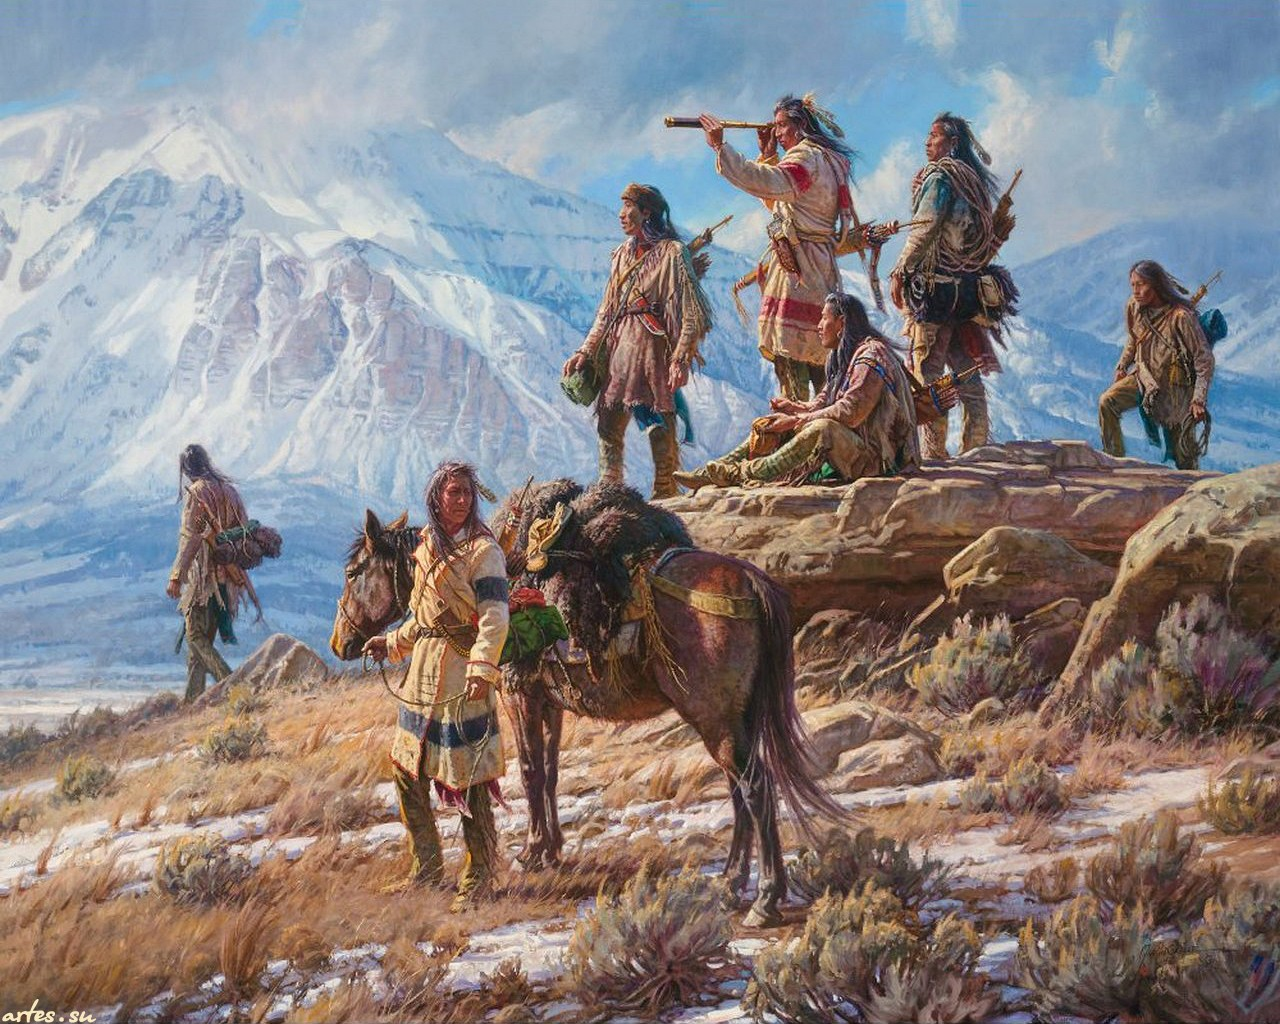 free native american wallpaper backgrounds   weddingdressincom 1280x1024